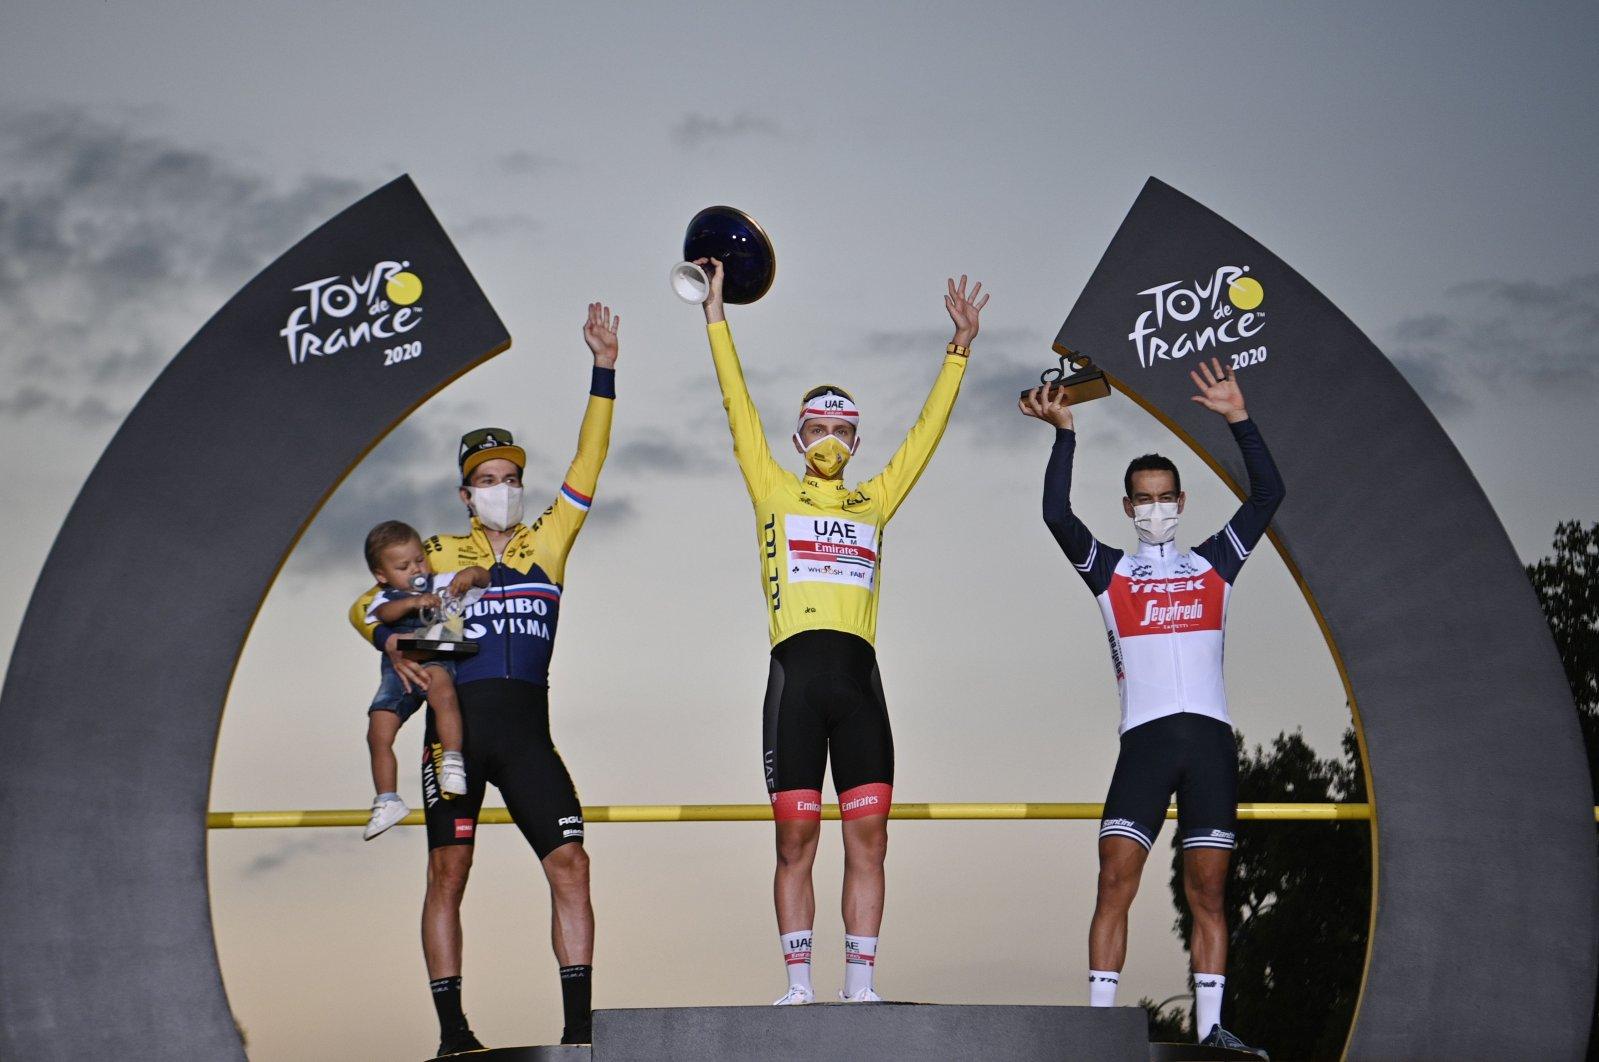 Team UAE rider Tadej Pogacar (C) celebrates on the podium between Team Jumbo rider Primoz Roglic (L) and Team Trek rider Richie Porte after winning the 107th edition of the Tour de France cycling race, Paris, France, Sept. 20, 2020. (AFP Photo)